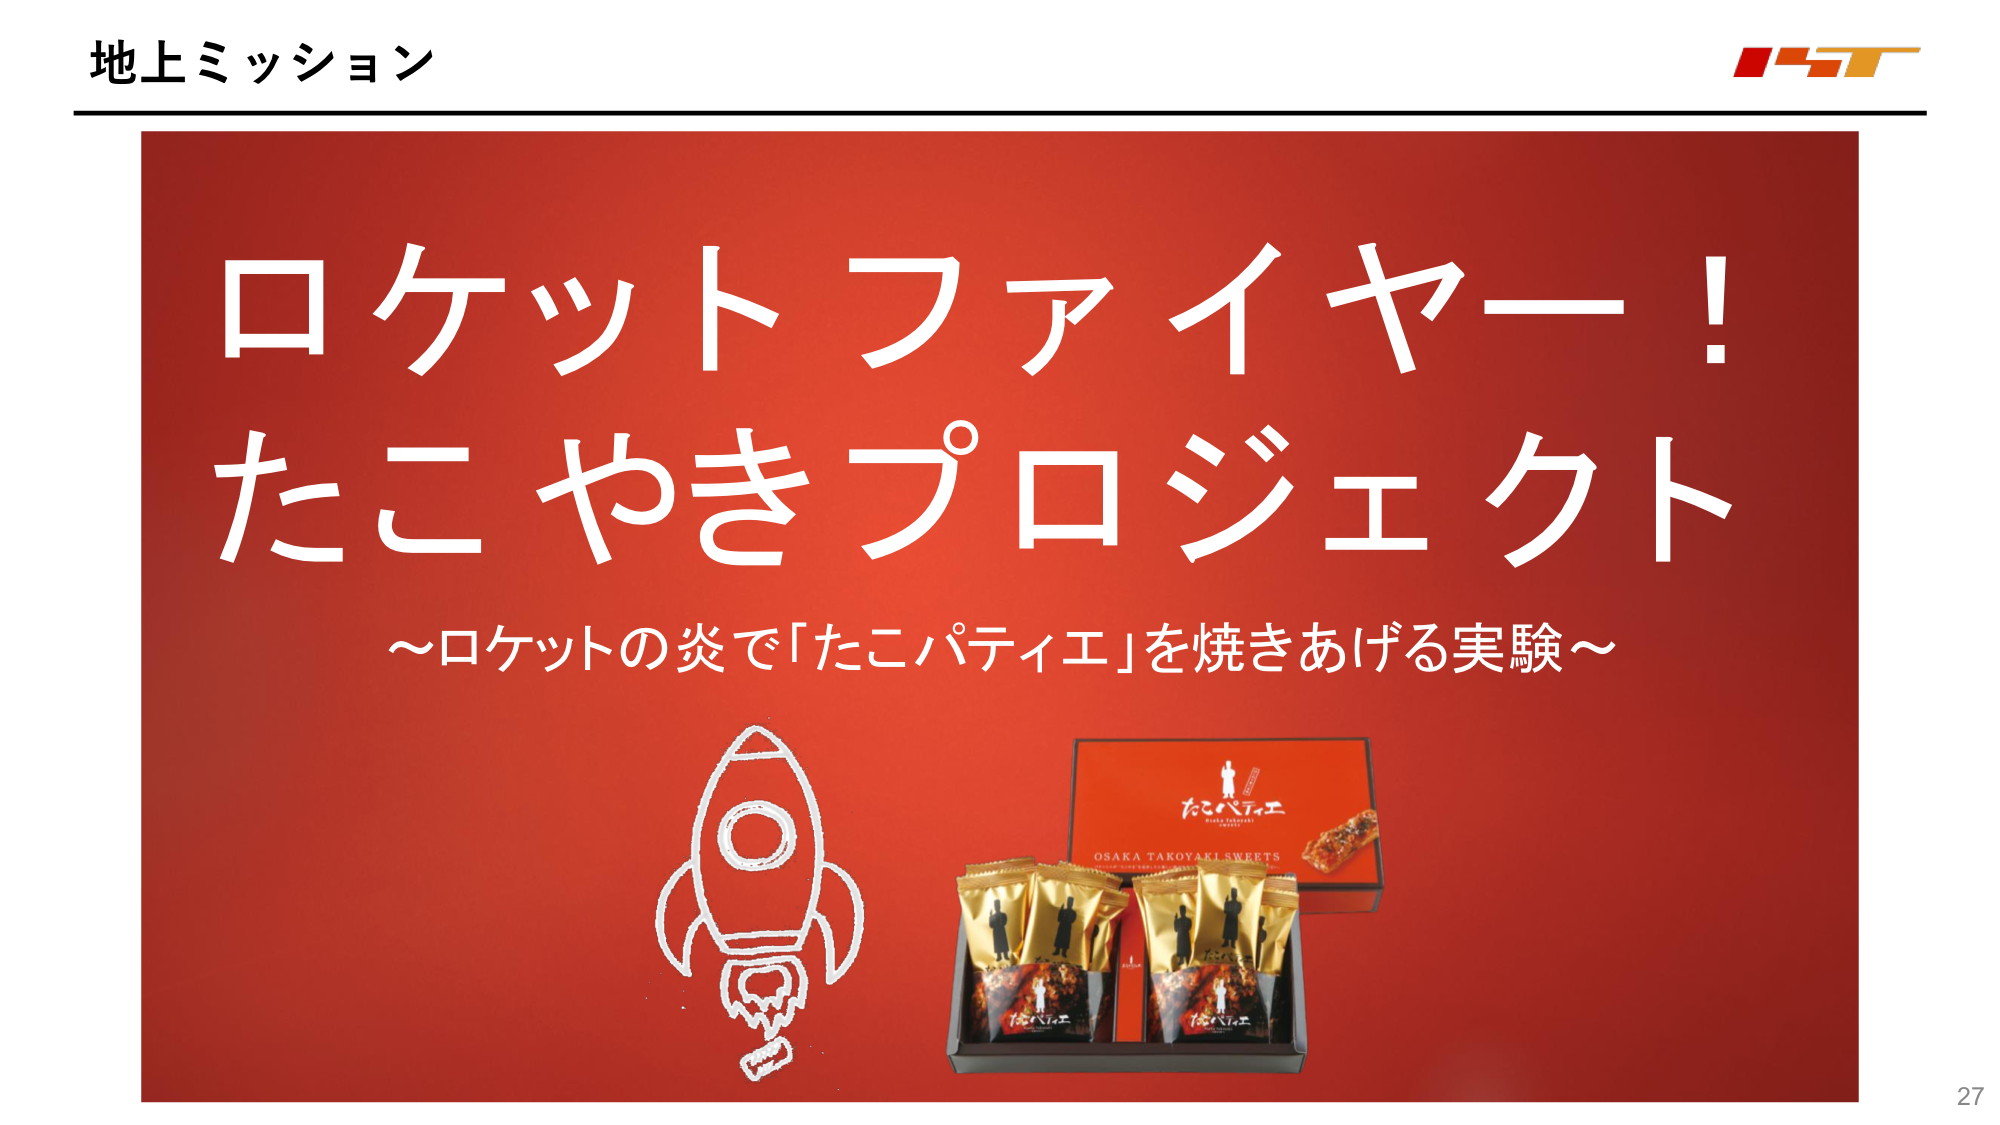 f:id:Imamura:20191126135248p:plain